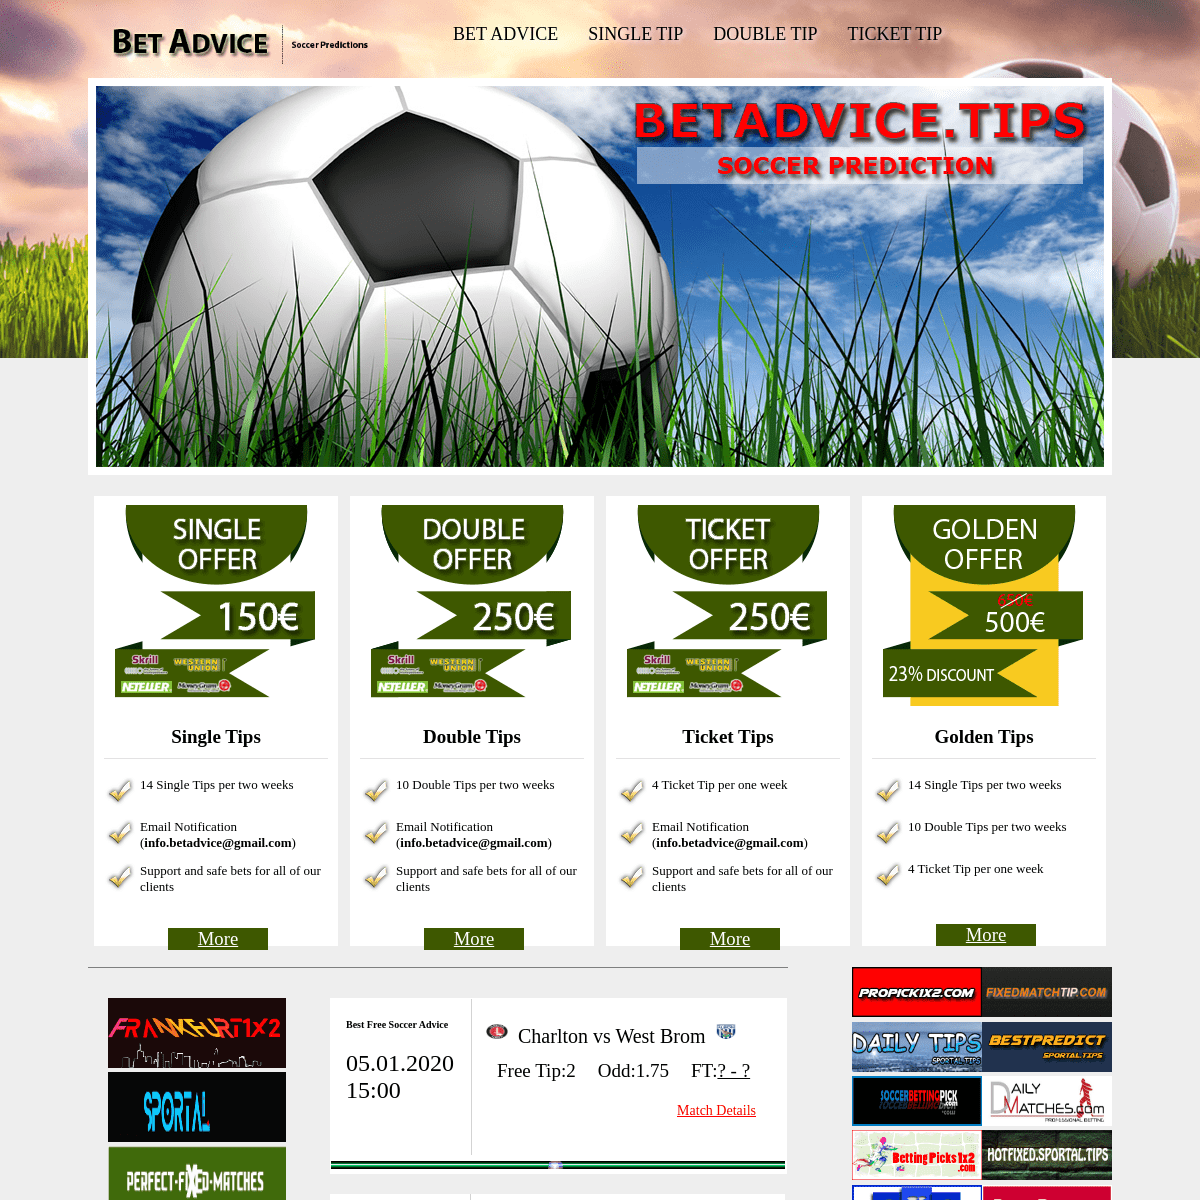 football form guide for bettingadvice